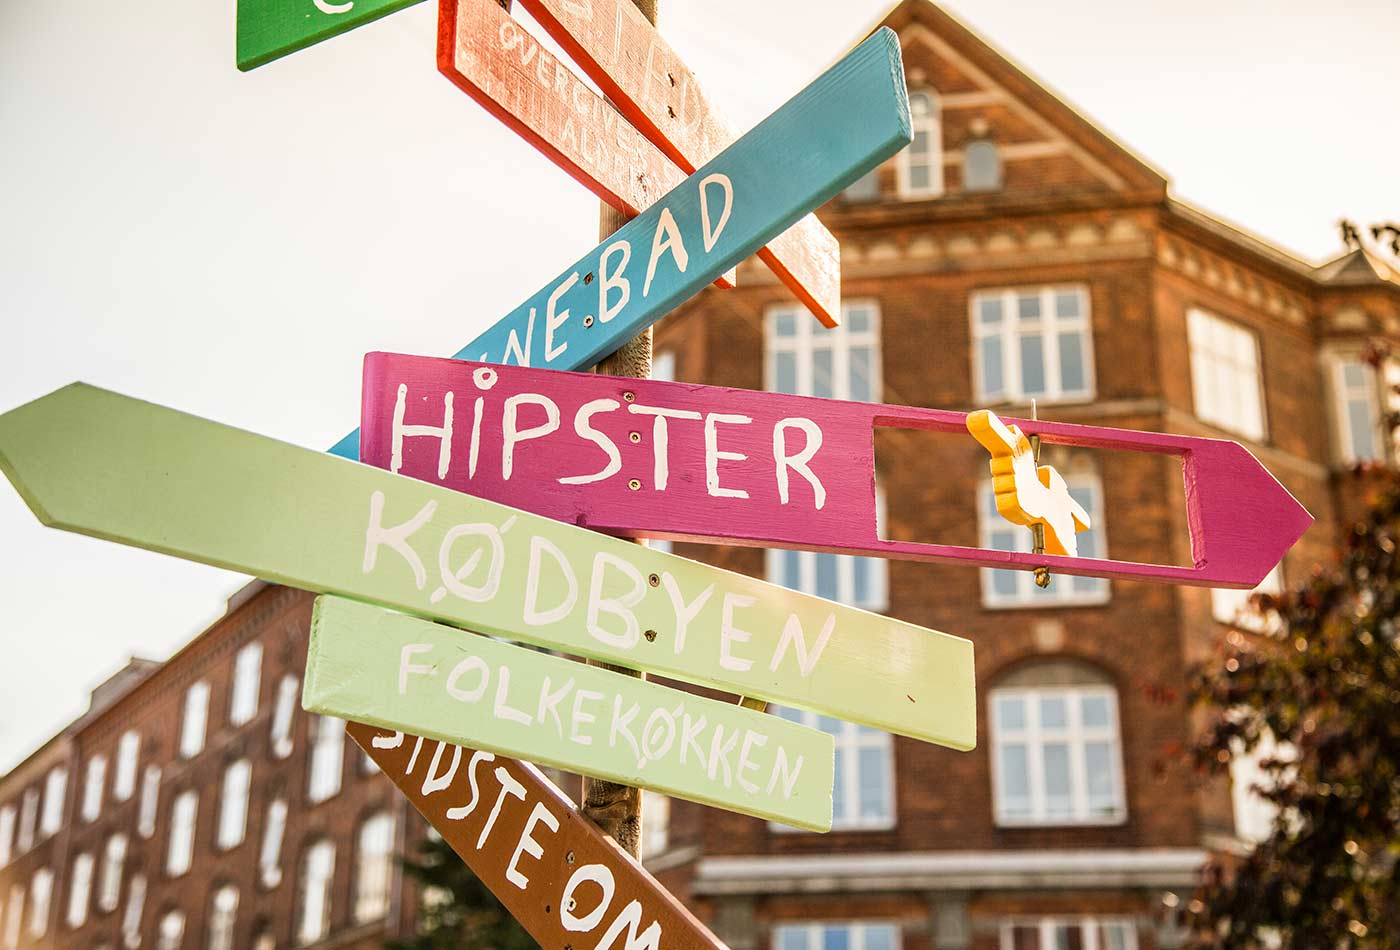 Hipster Pointer.